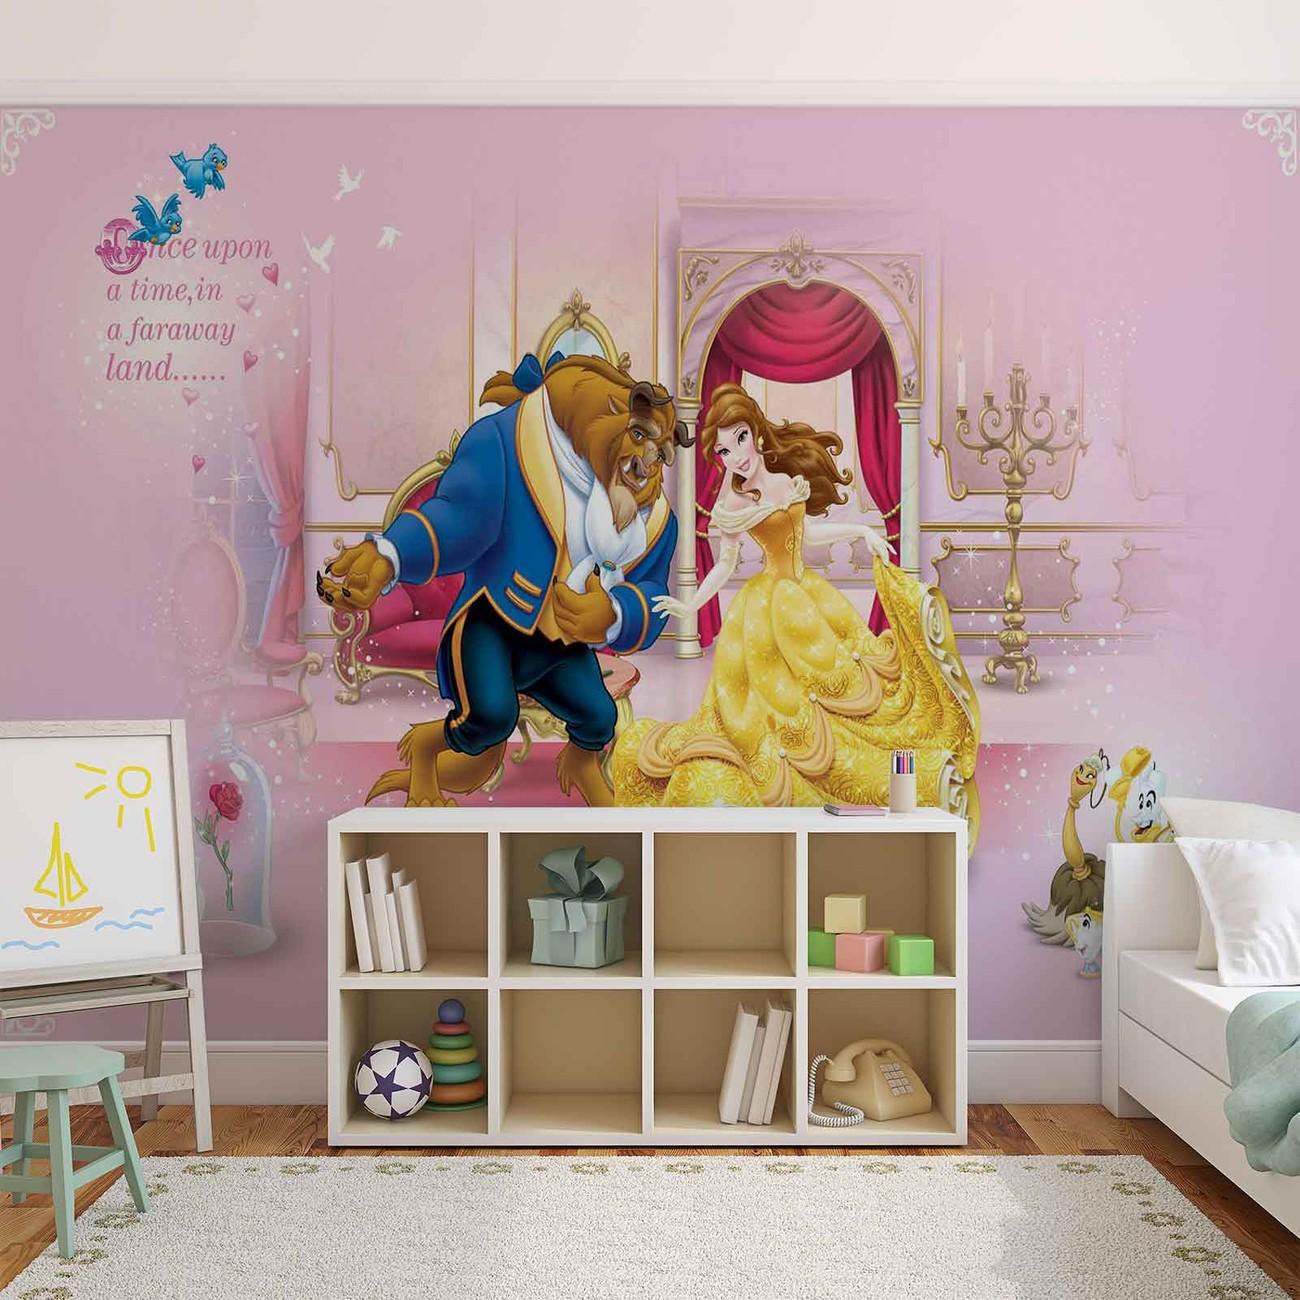 Disney princesses beauty beast wall paper mural buy at for Disney princess wall mural tesco